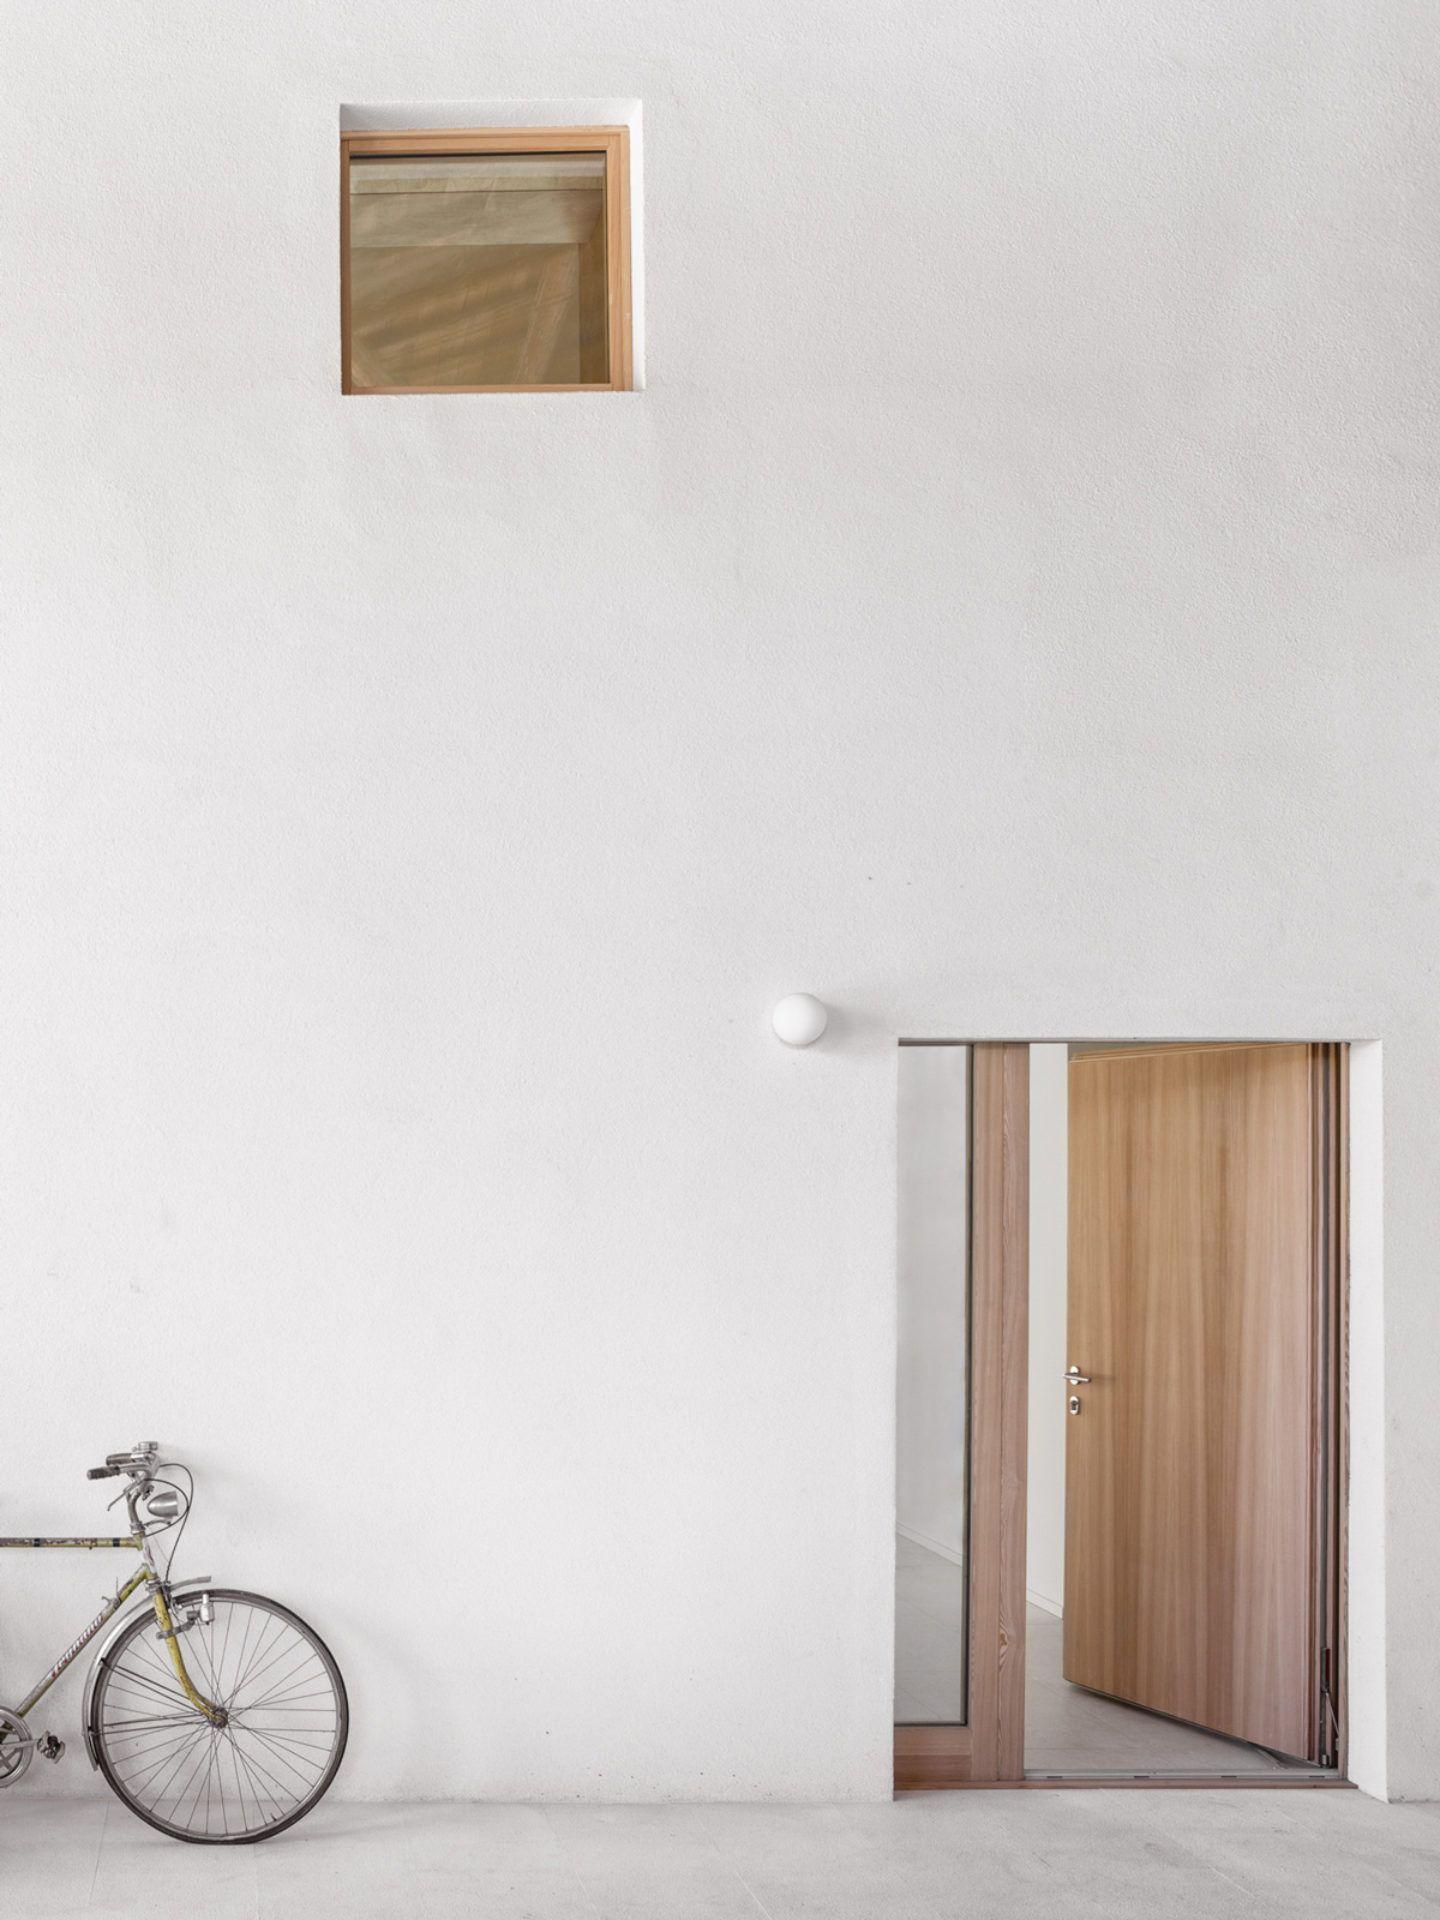 IGNANT-Architecture-Studio-Wok-Country-Home-In-Chievo-24